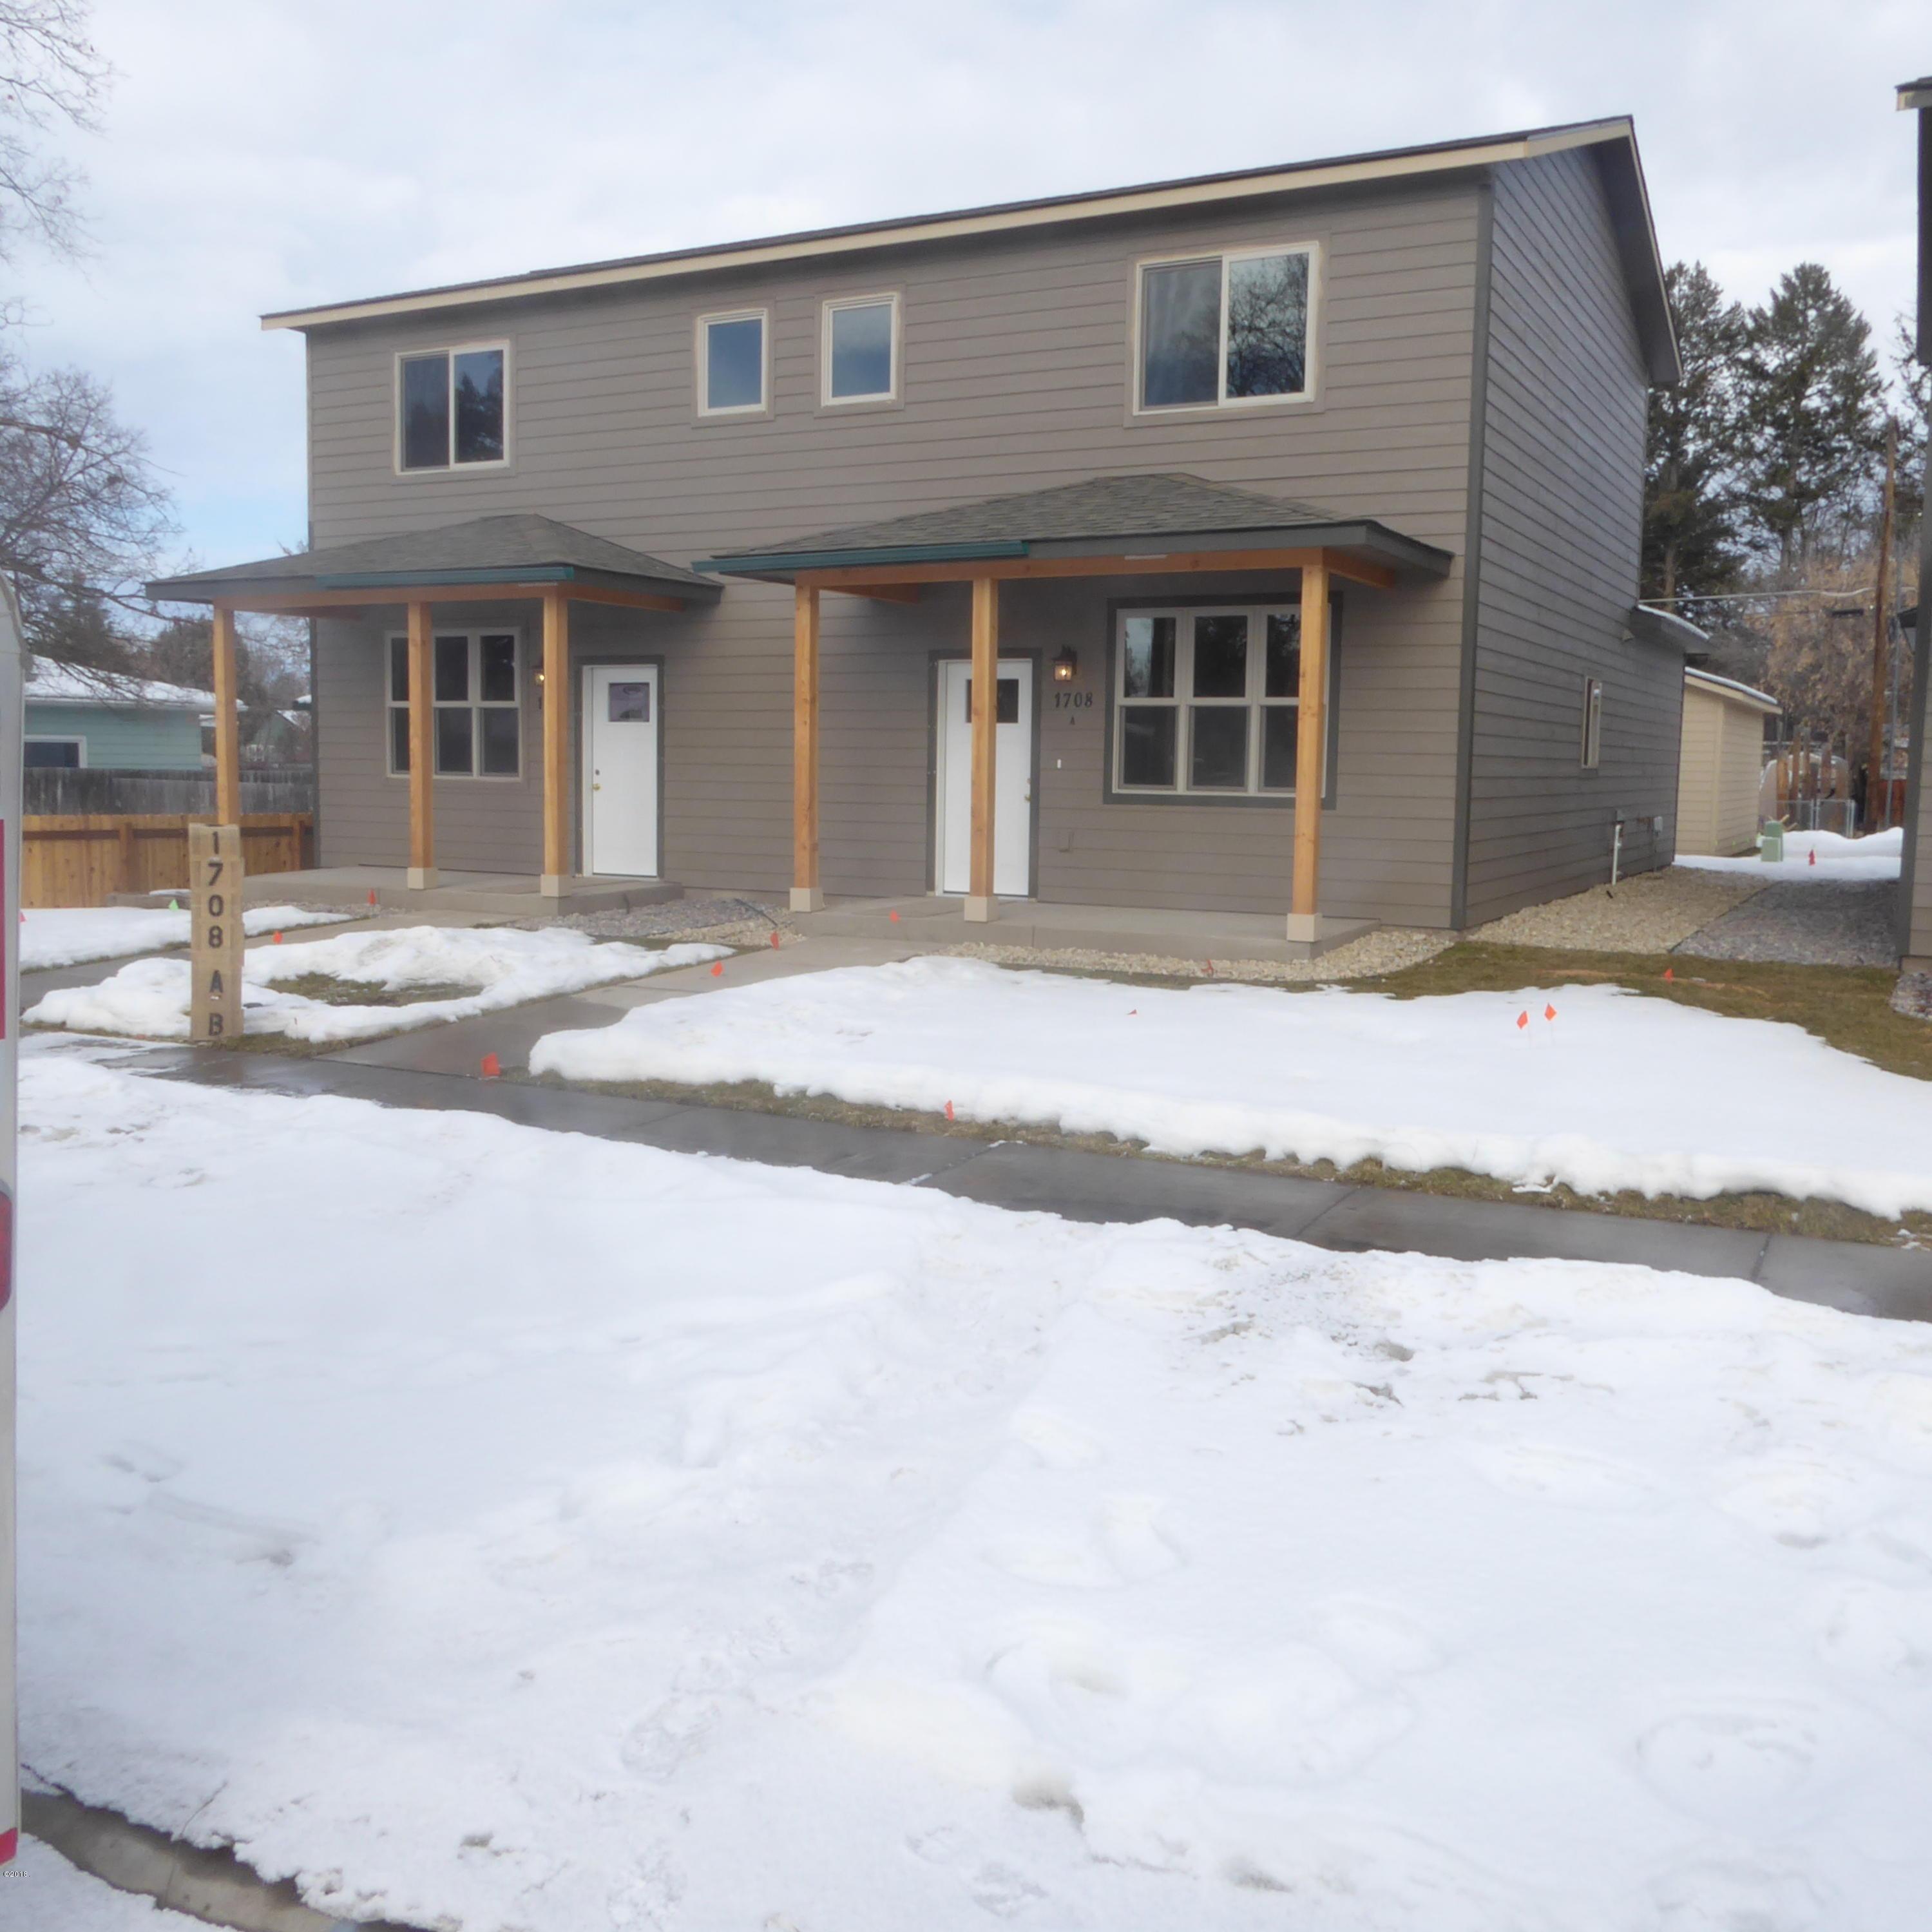 1708 A S 8th Street, Missoula, MT 59801